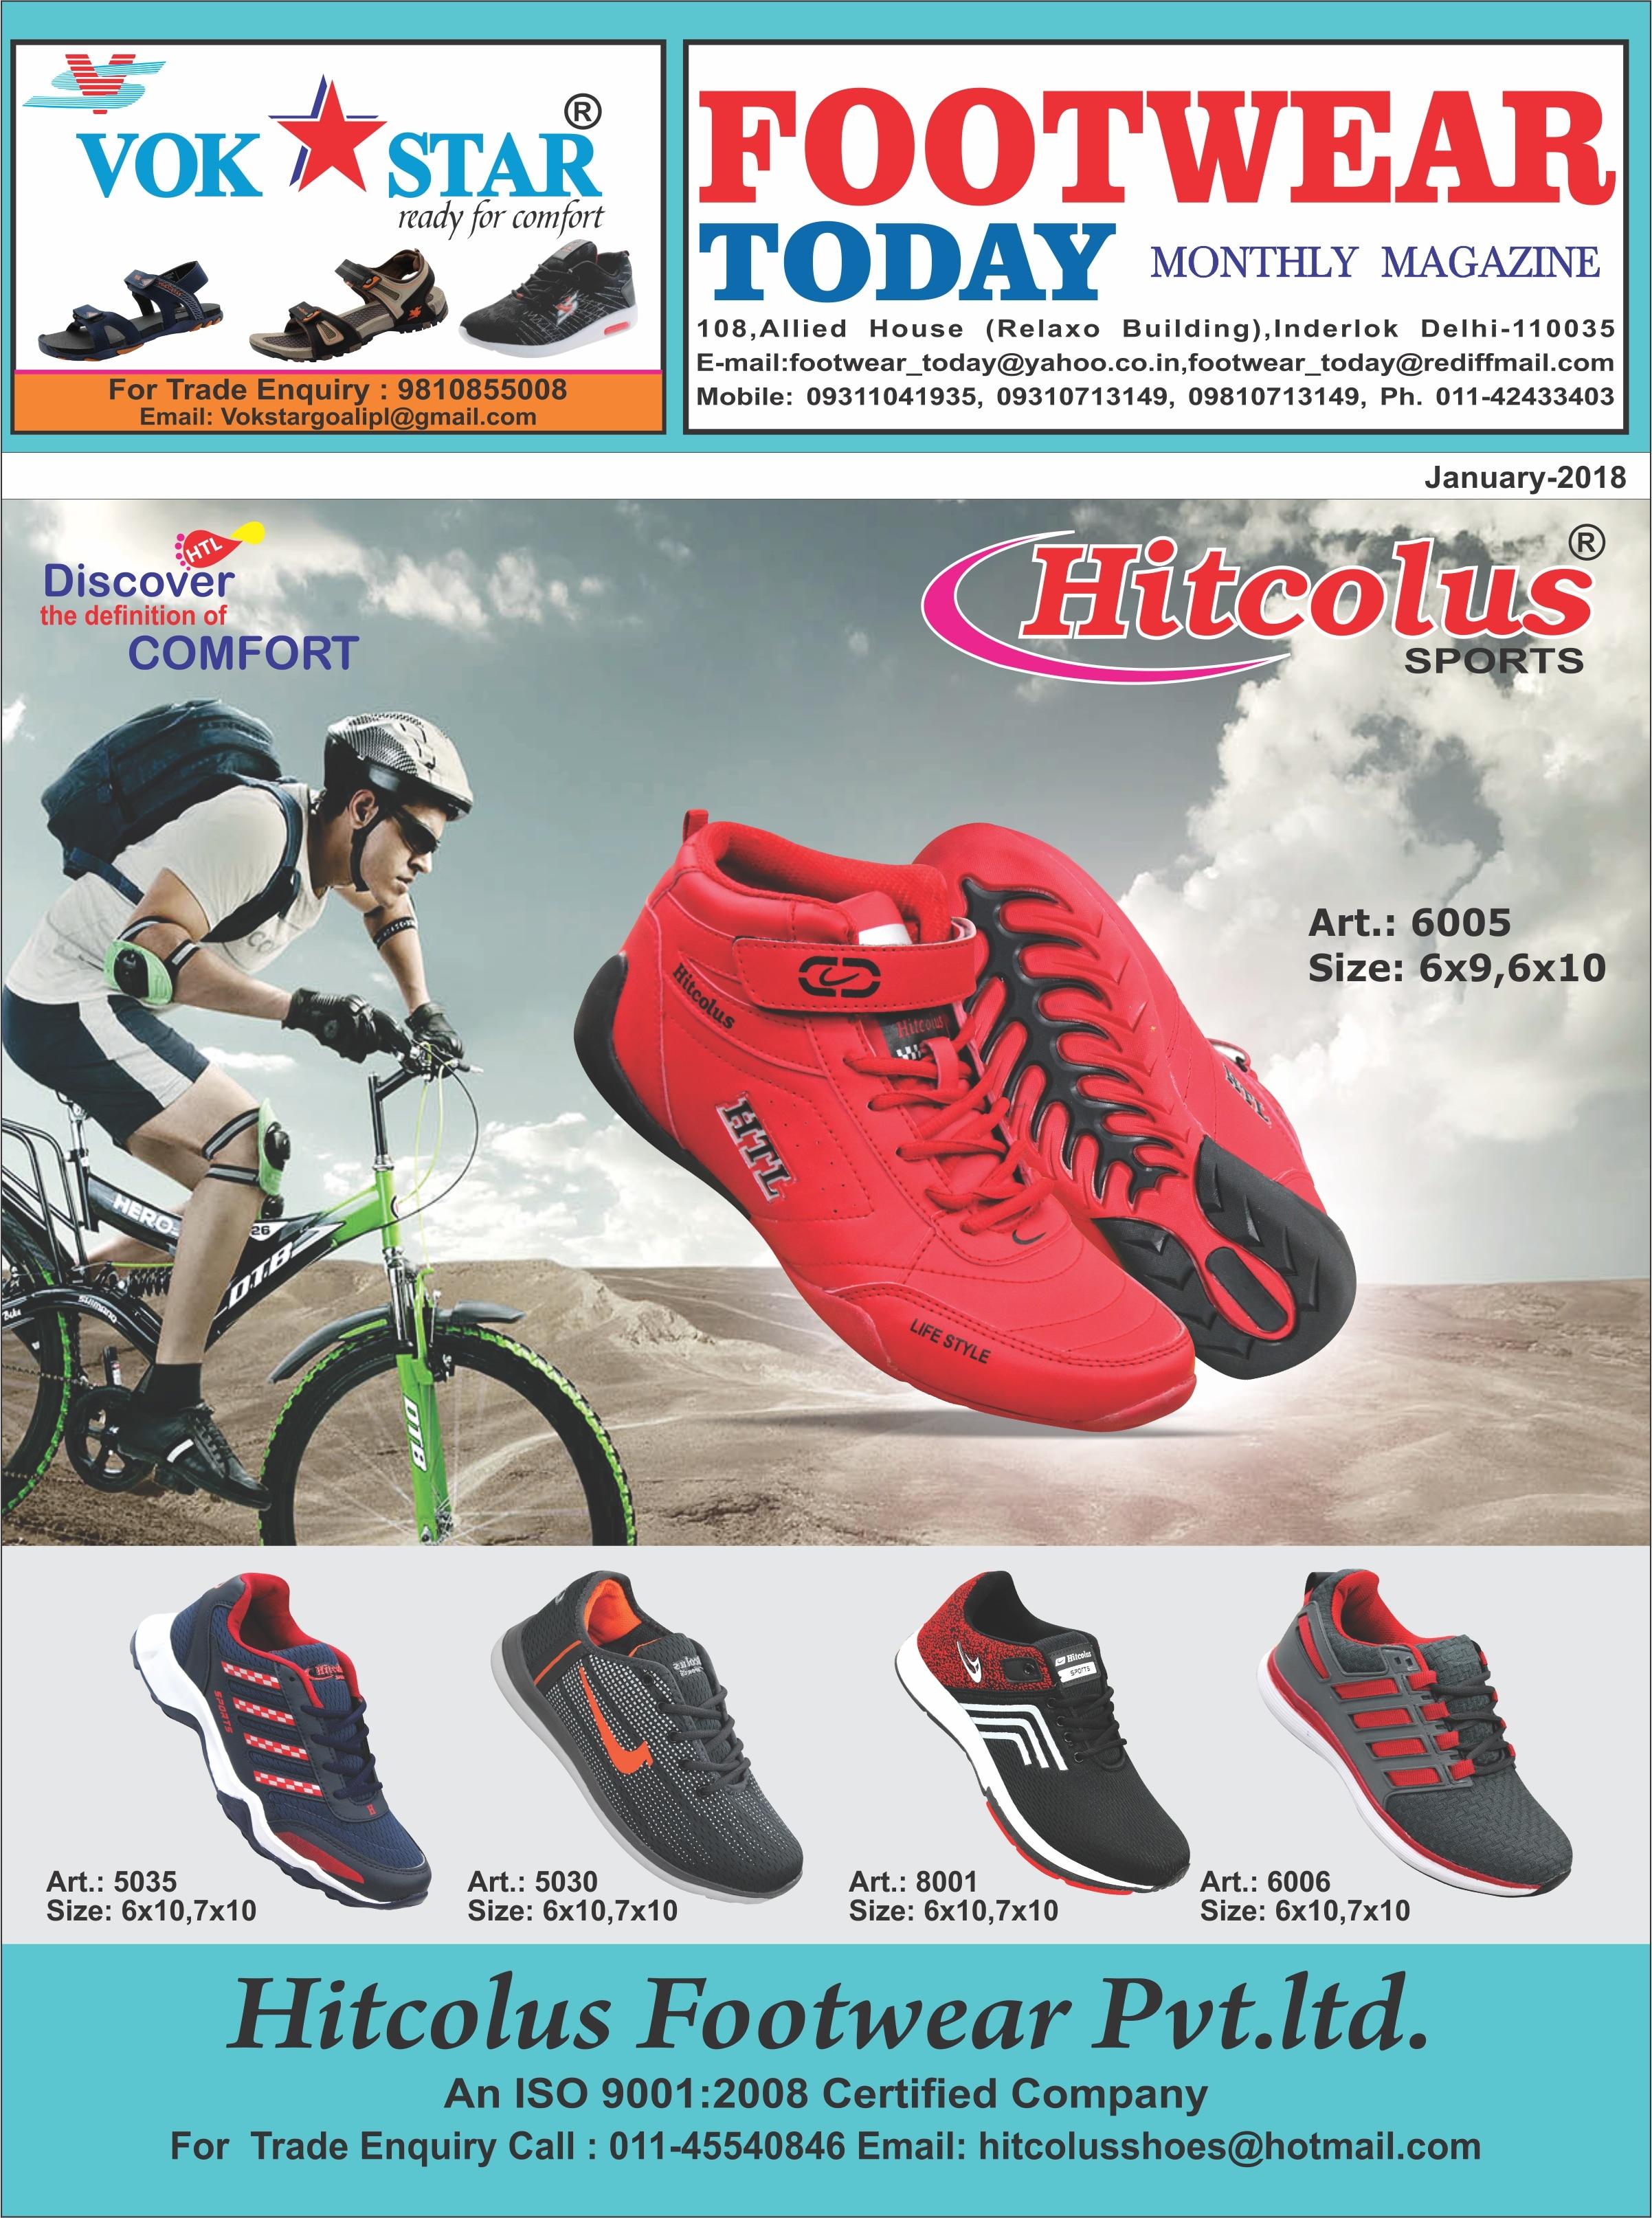 Footwear Today Magazine